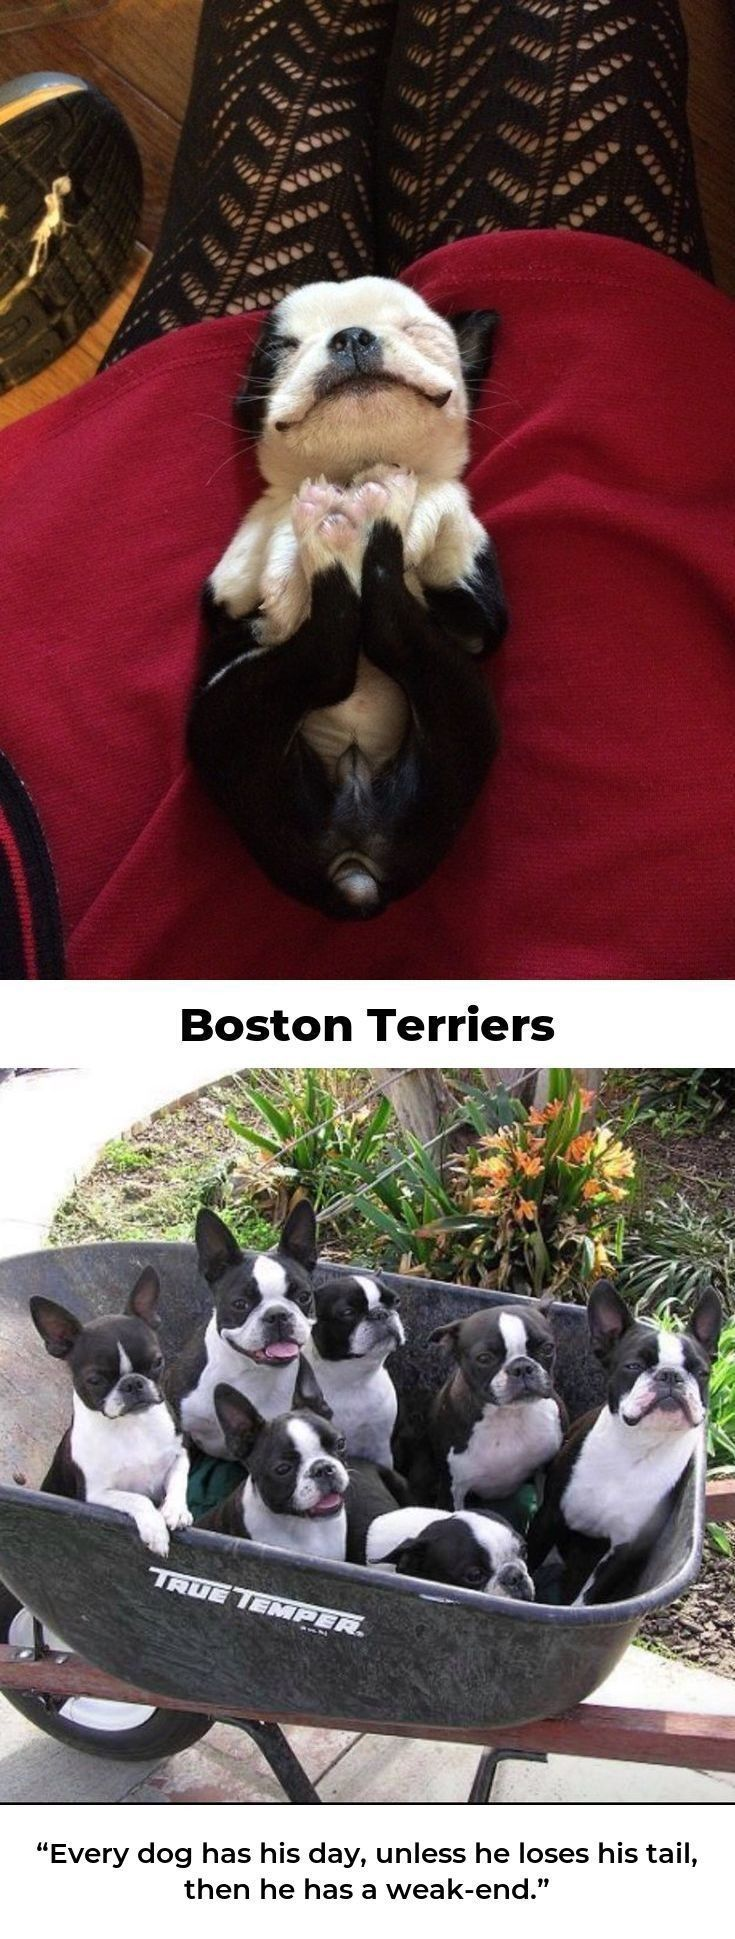 Boston Terrier Love bostonterrieroftheday